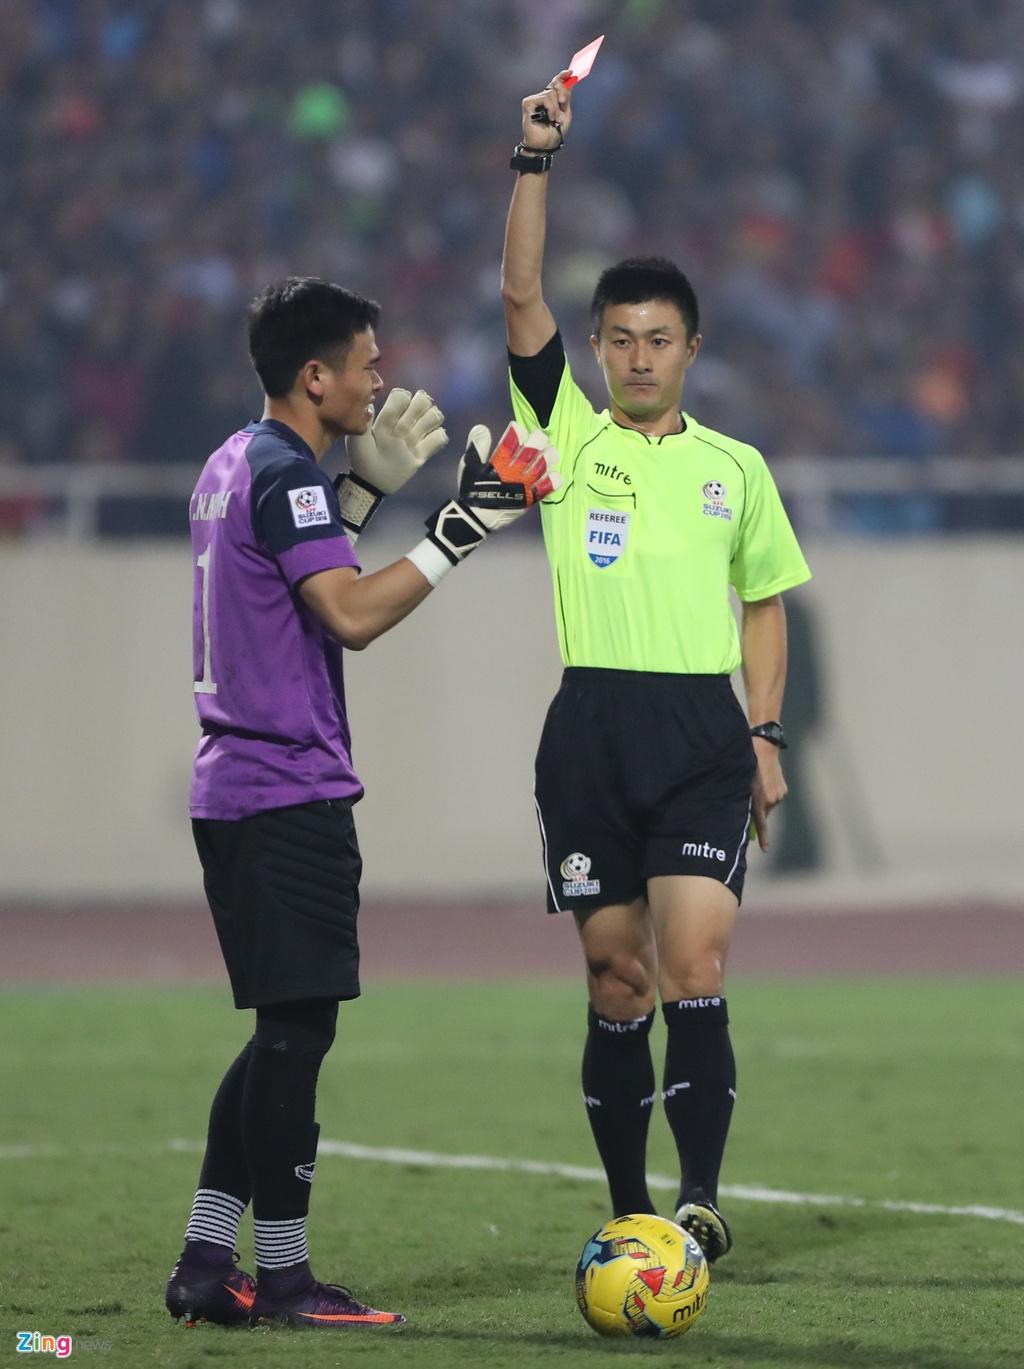 Ngoc Hai lam thu mon bat dac di vi the do cua Nguyen Manh hinh anh 5